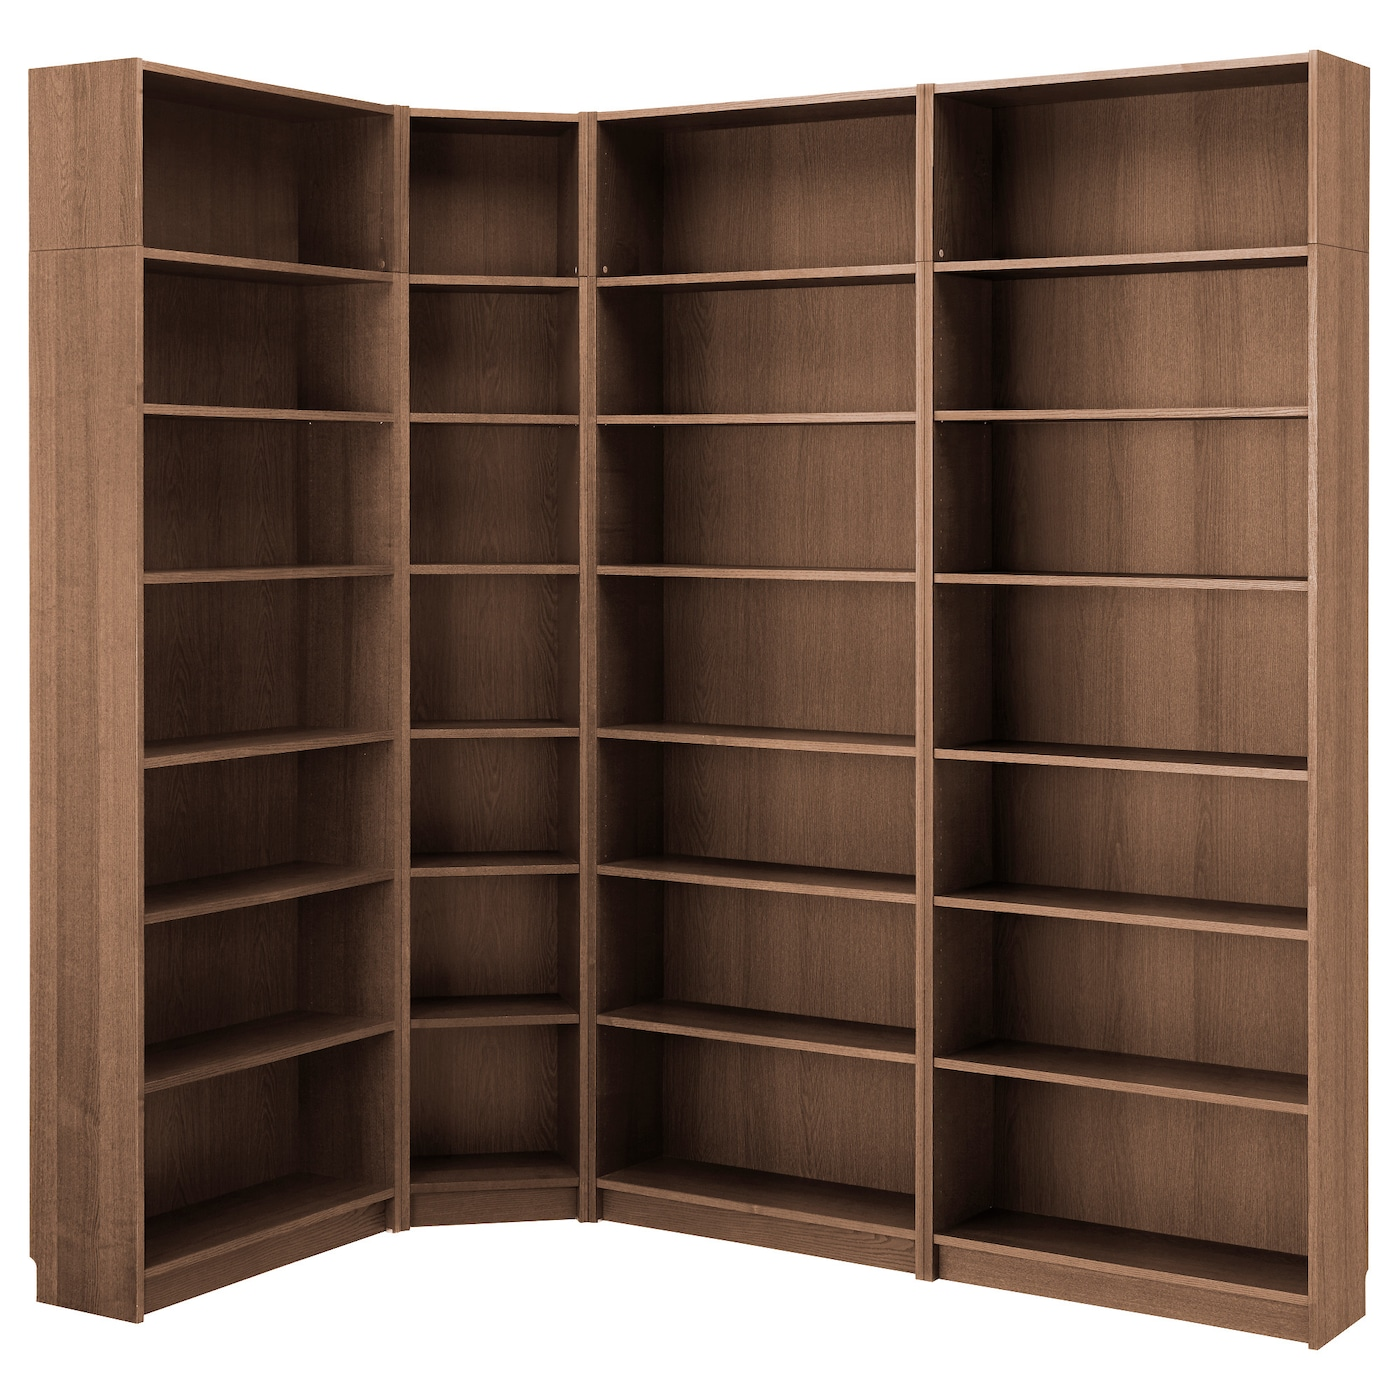 Billy bookcase brown ash veneer 215 135x237x28 cm ikea - Ikea bibliotheque angle ...